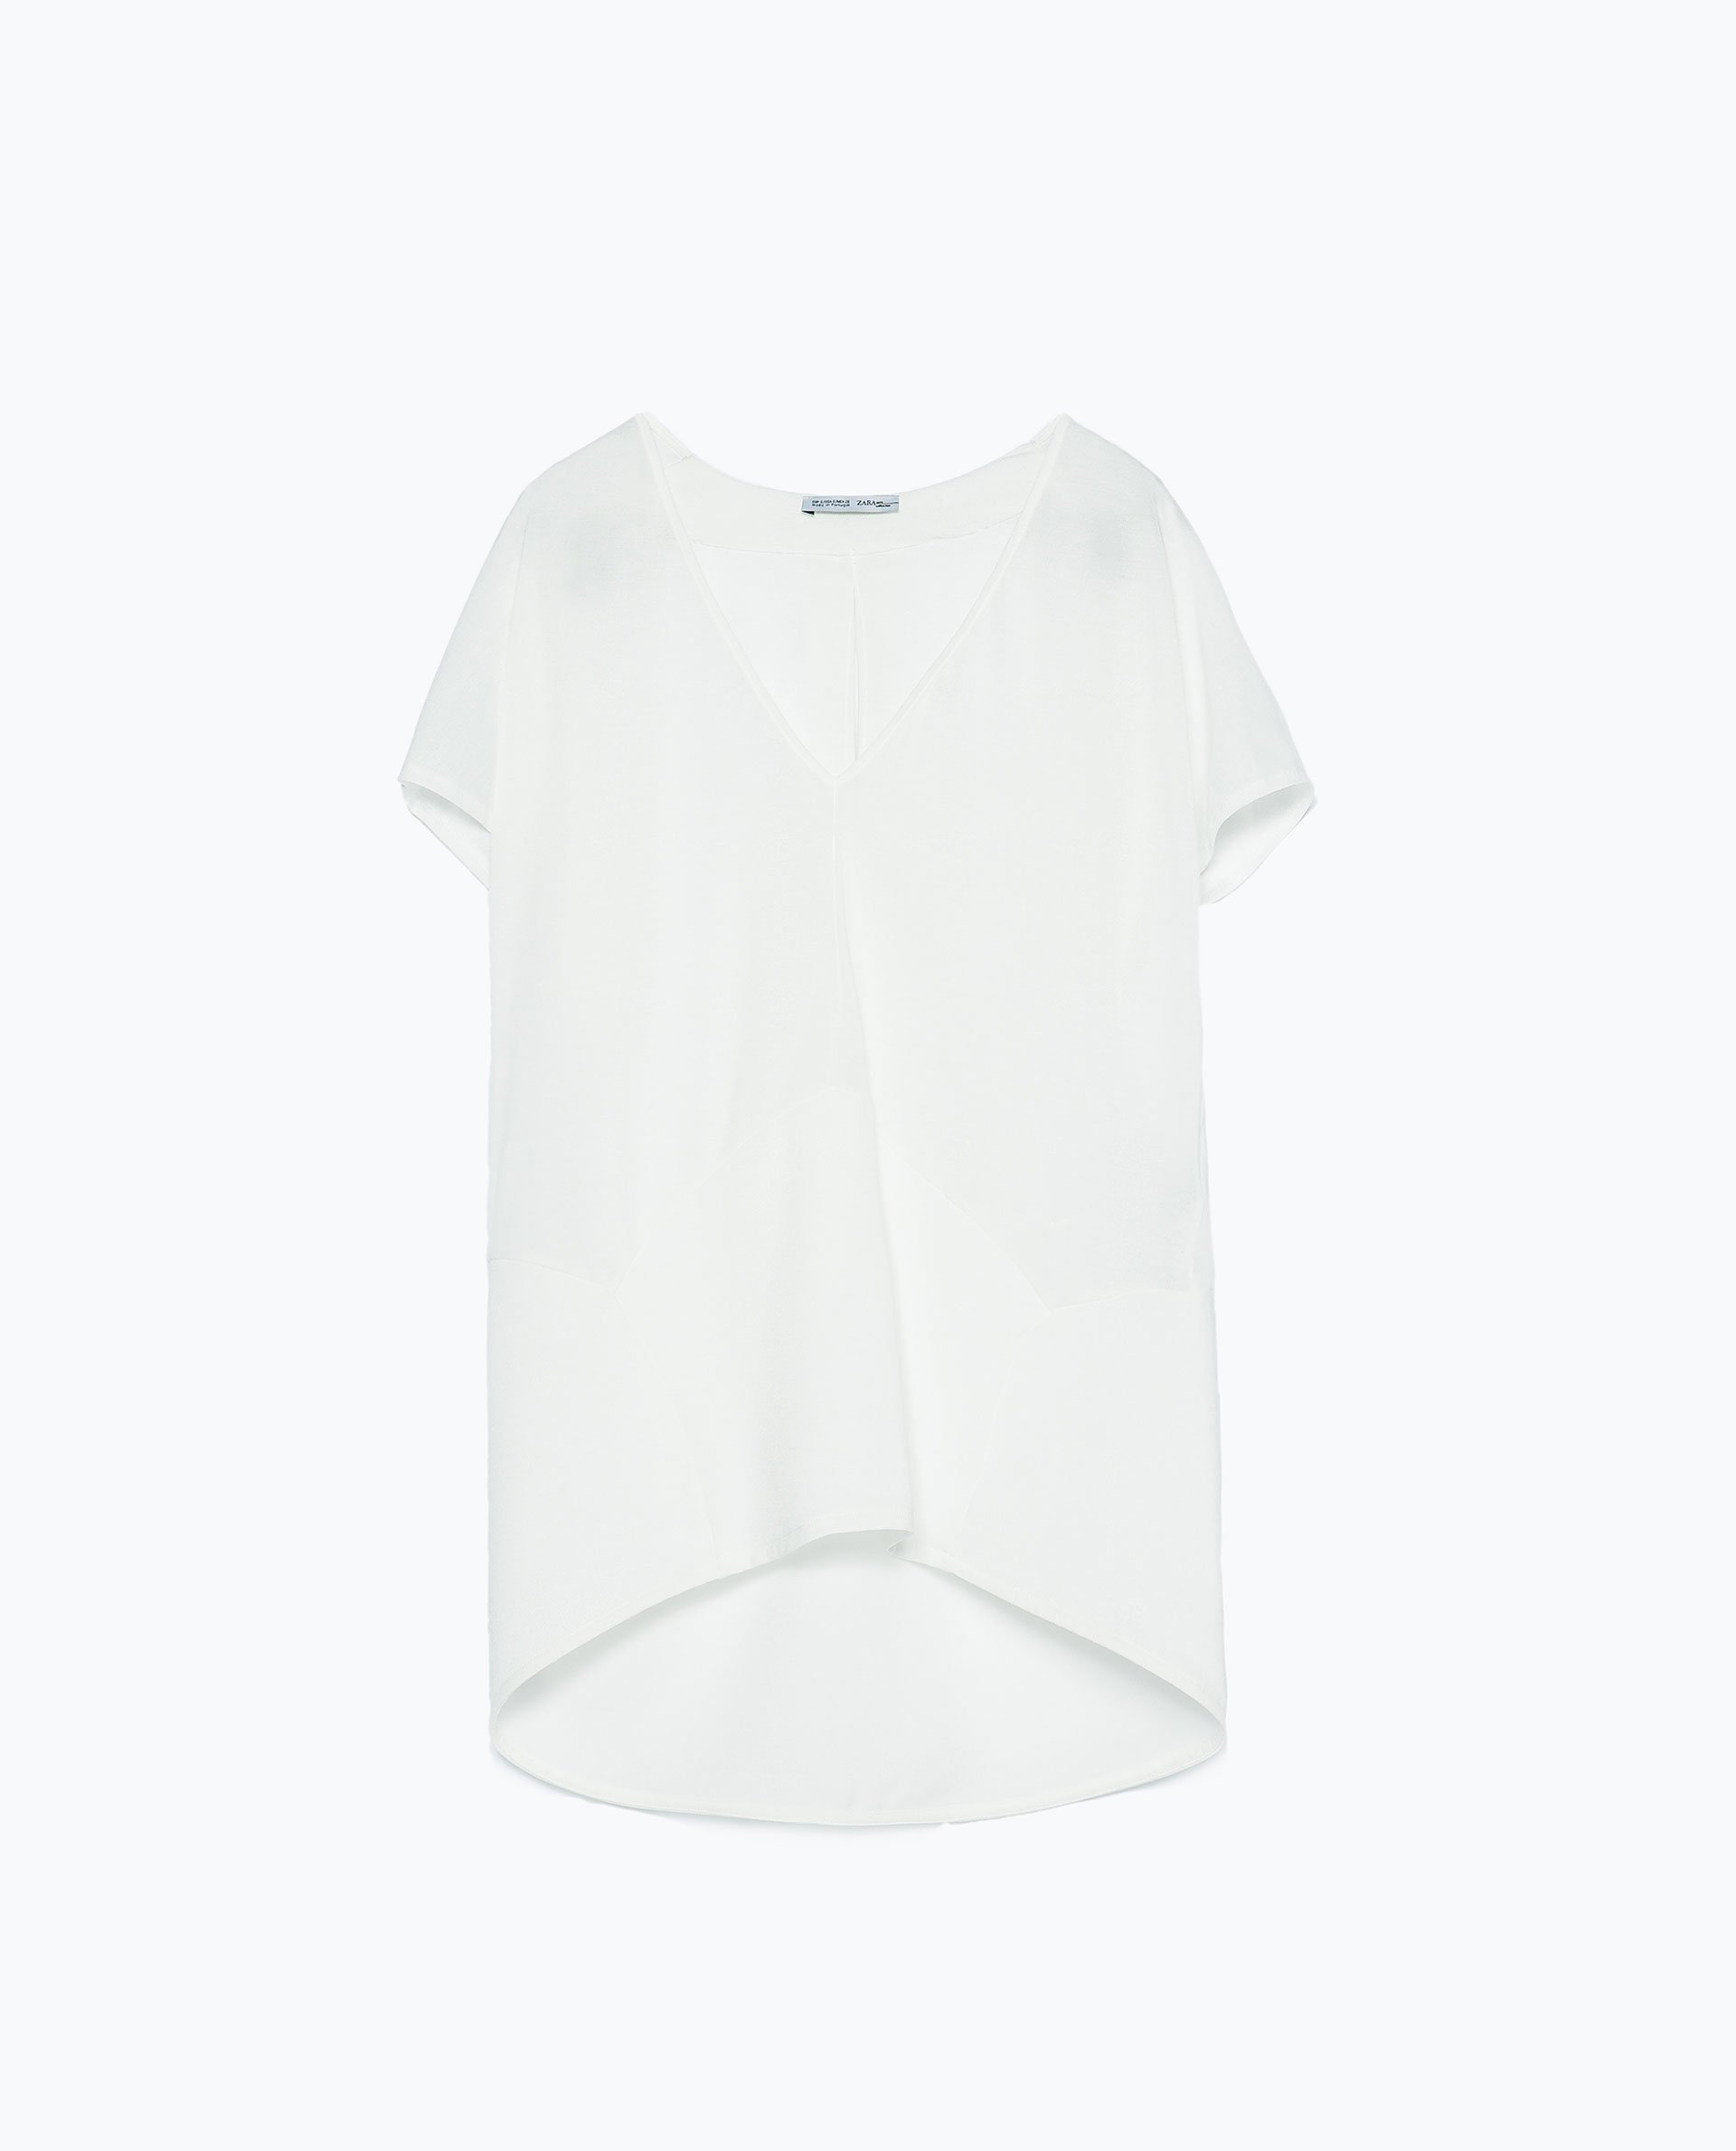 Zara Shirt Style Blouse 29